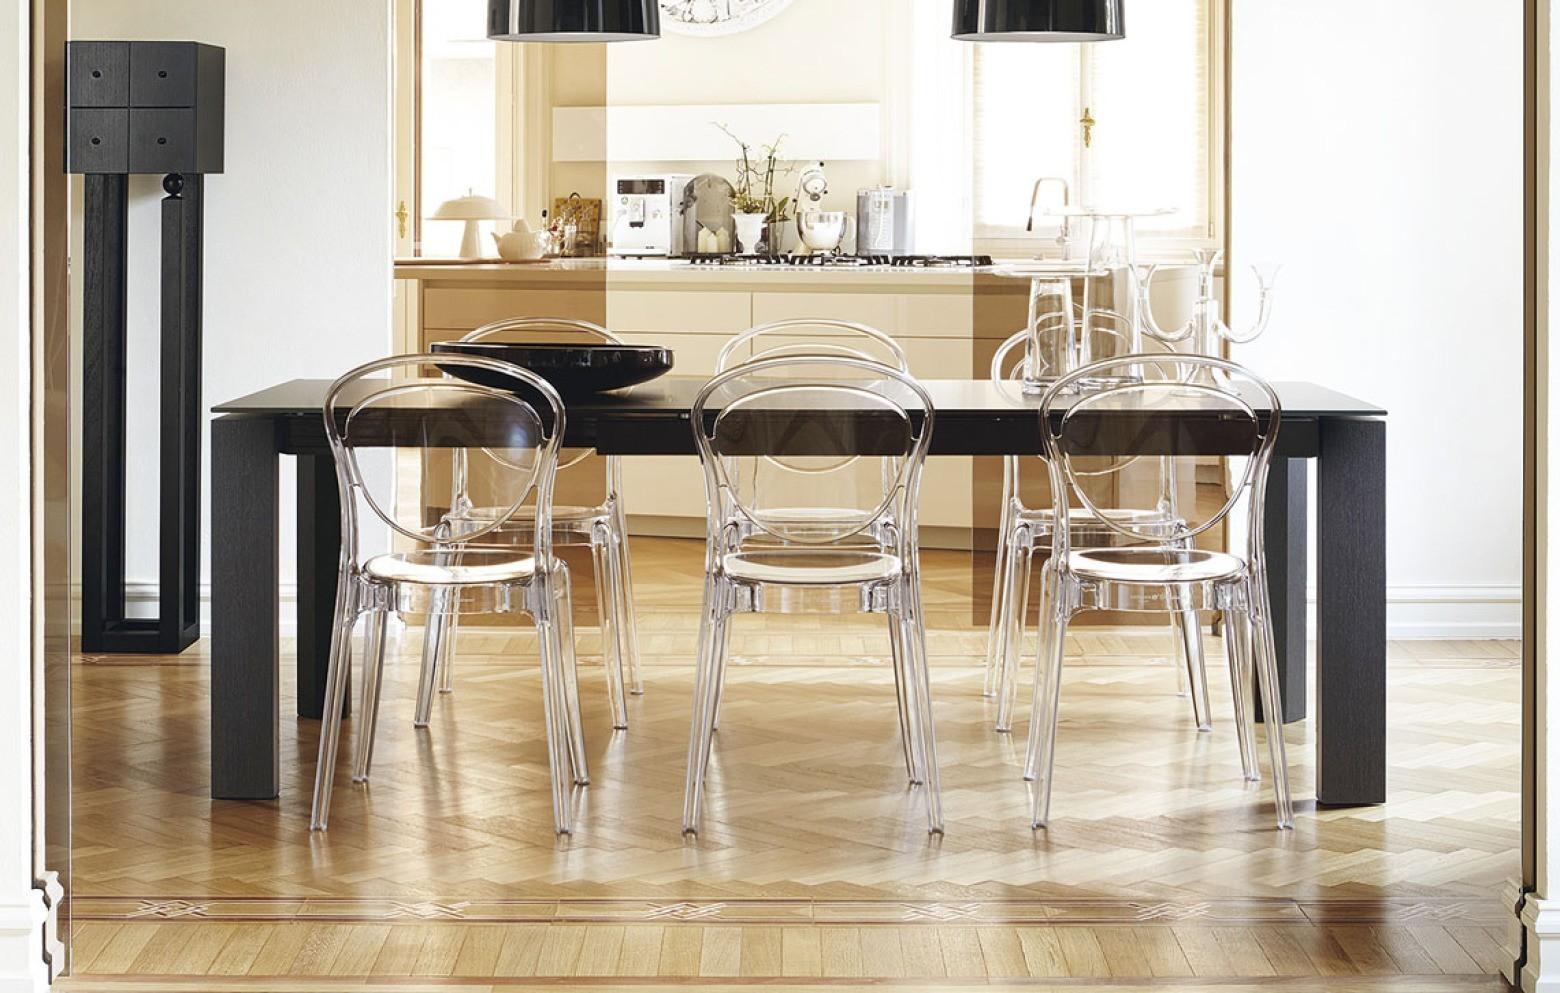 parisienne st hle tische st hle who 39 s perfect. Black Bedroom Furniture Sets. Home Design Ideas